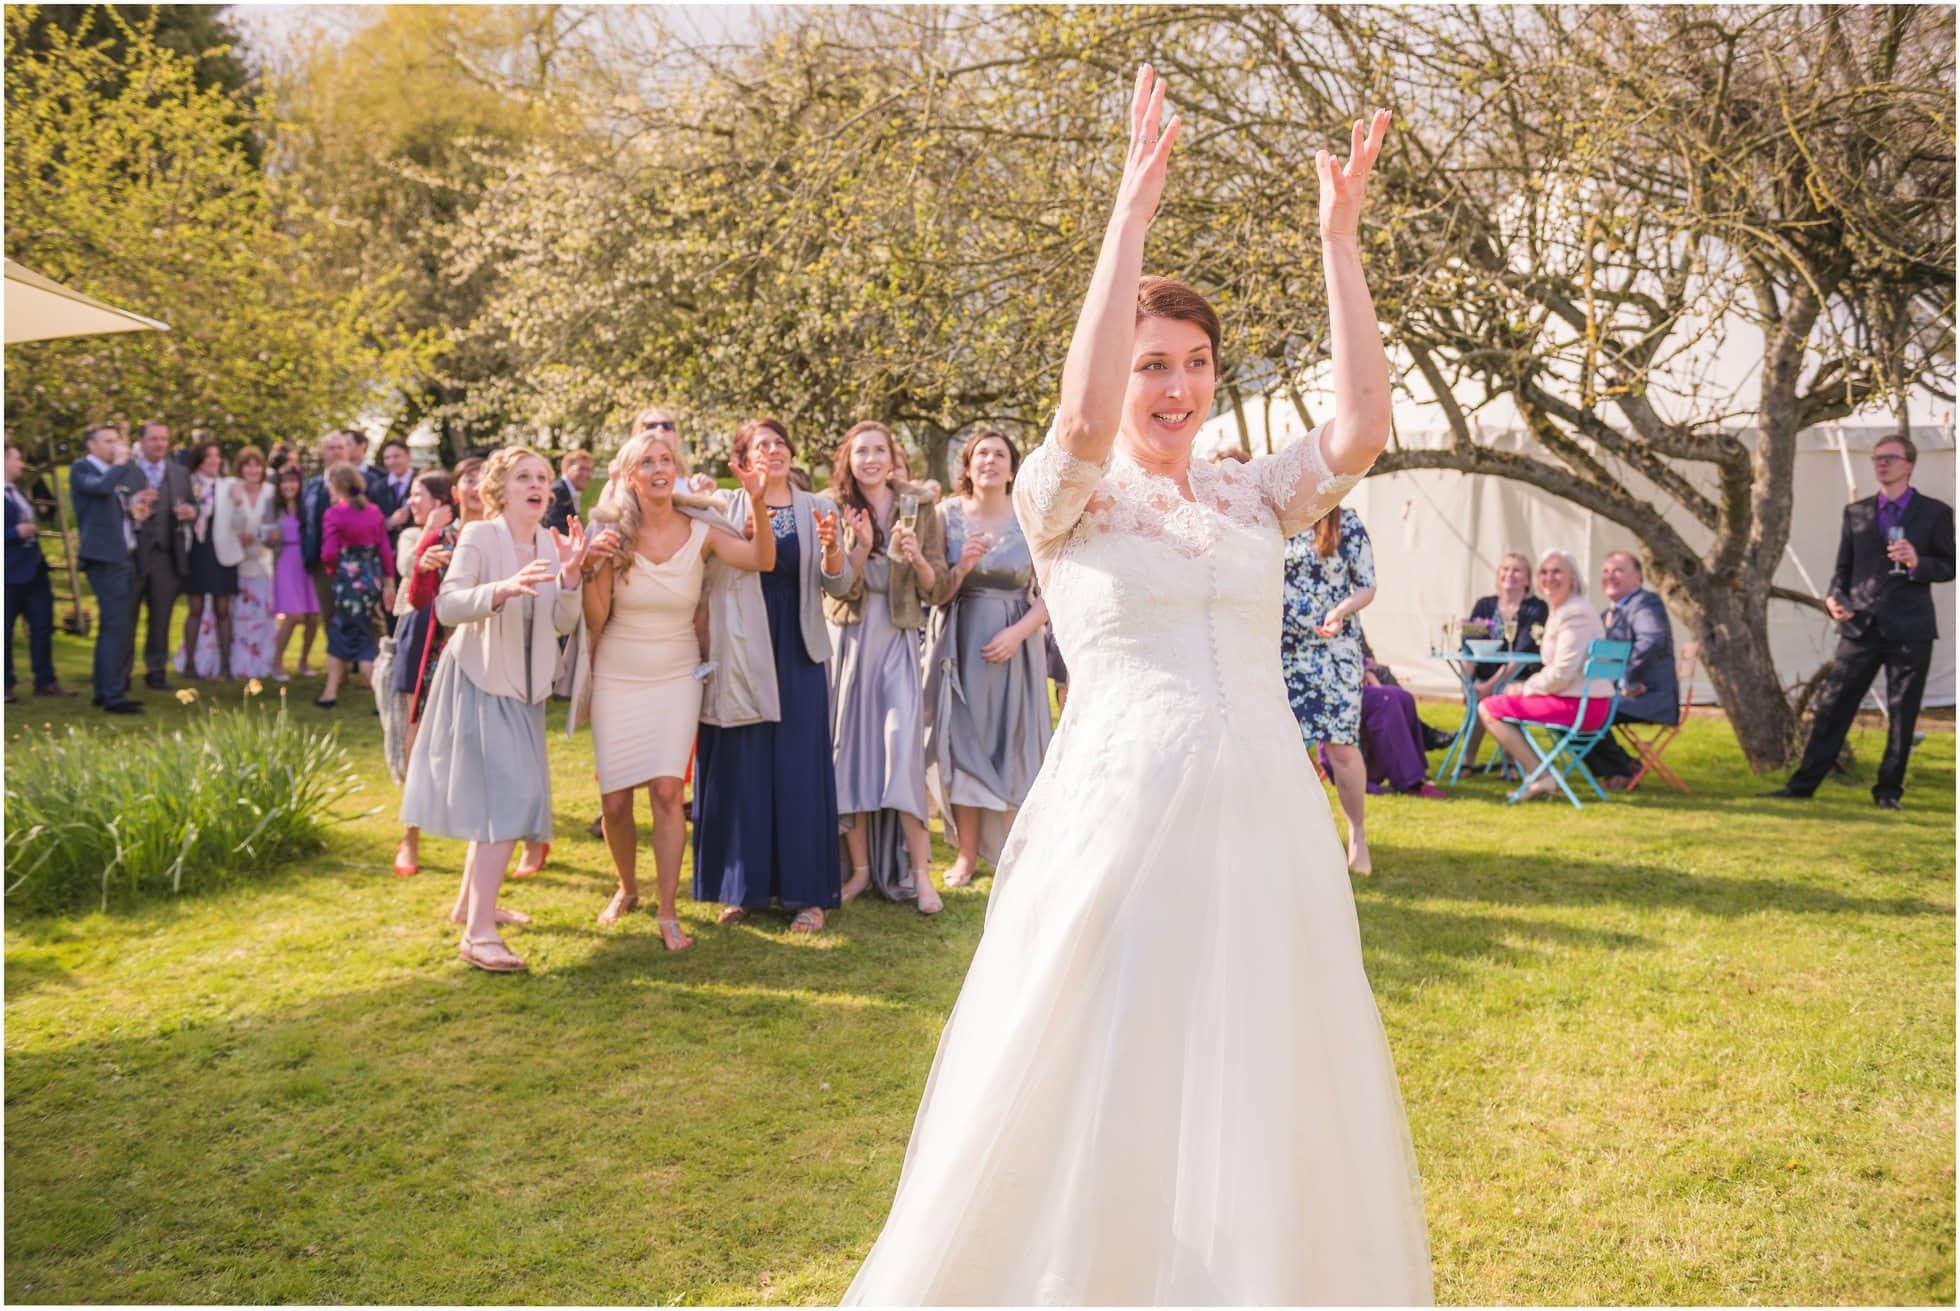 Tossing the bouquet - York Wedding Photographer